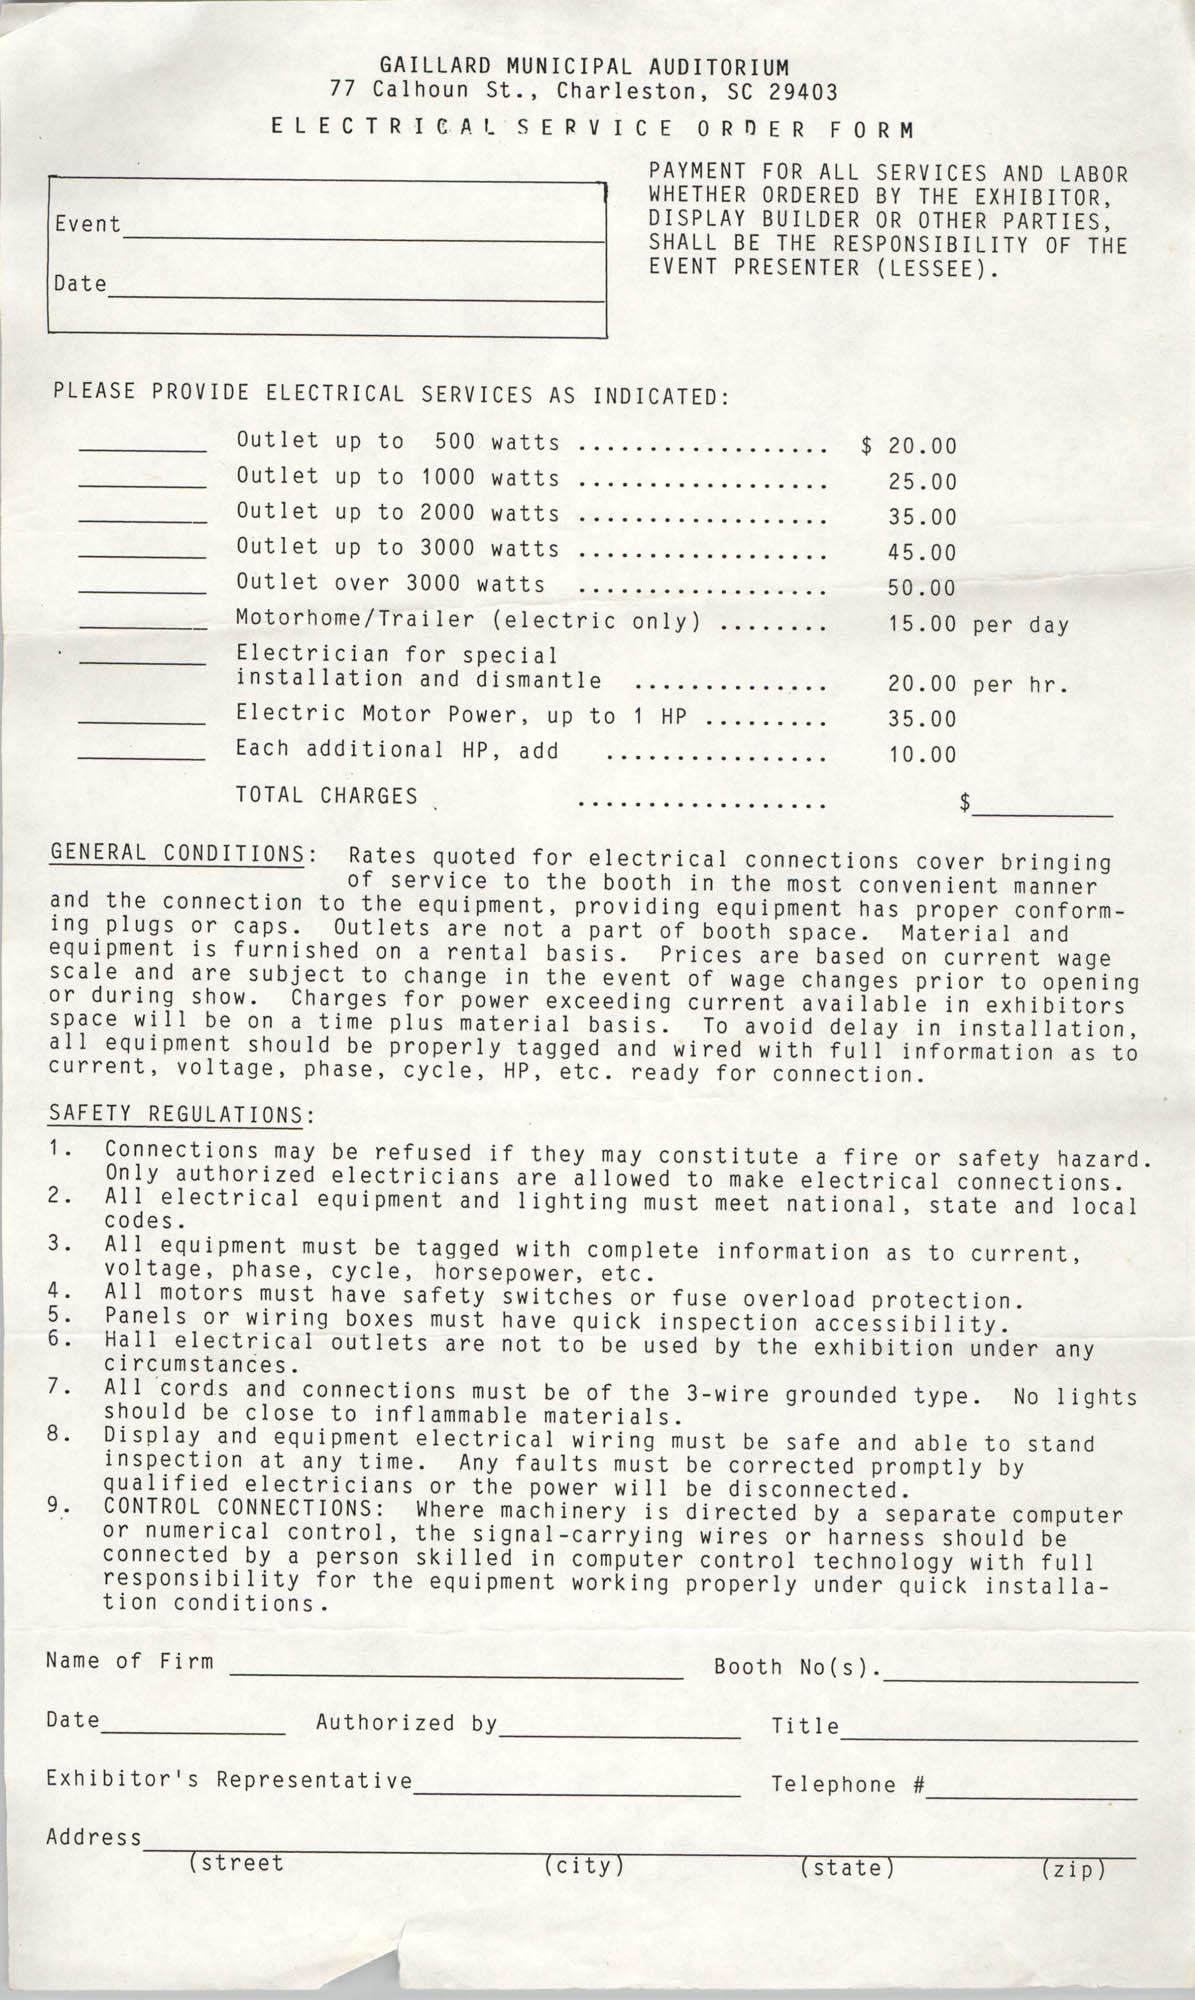 Electrical Service Order Form, Gaillard Municipal Auditorium